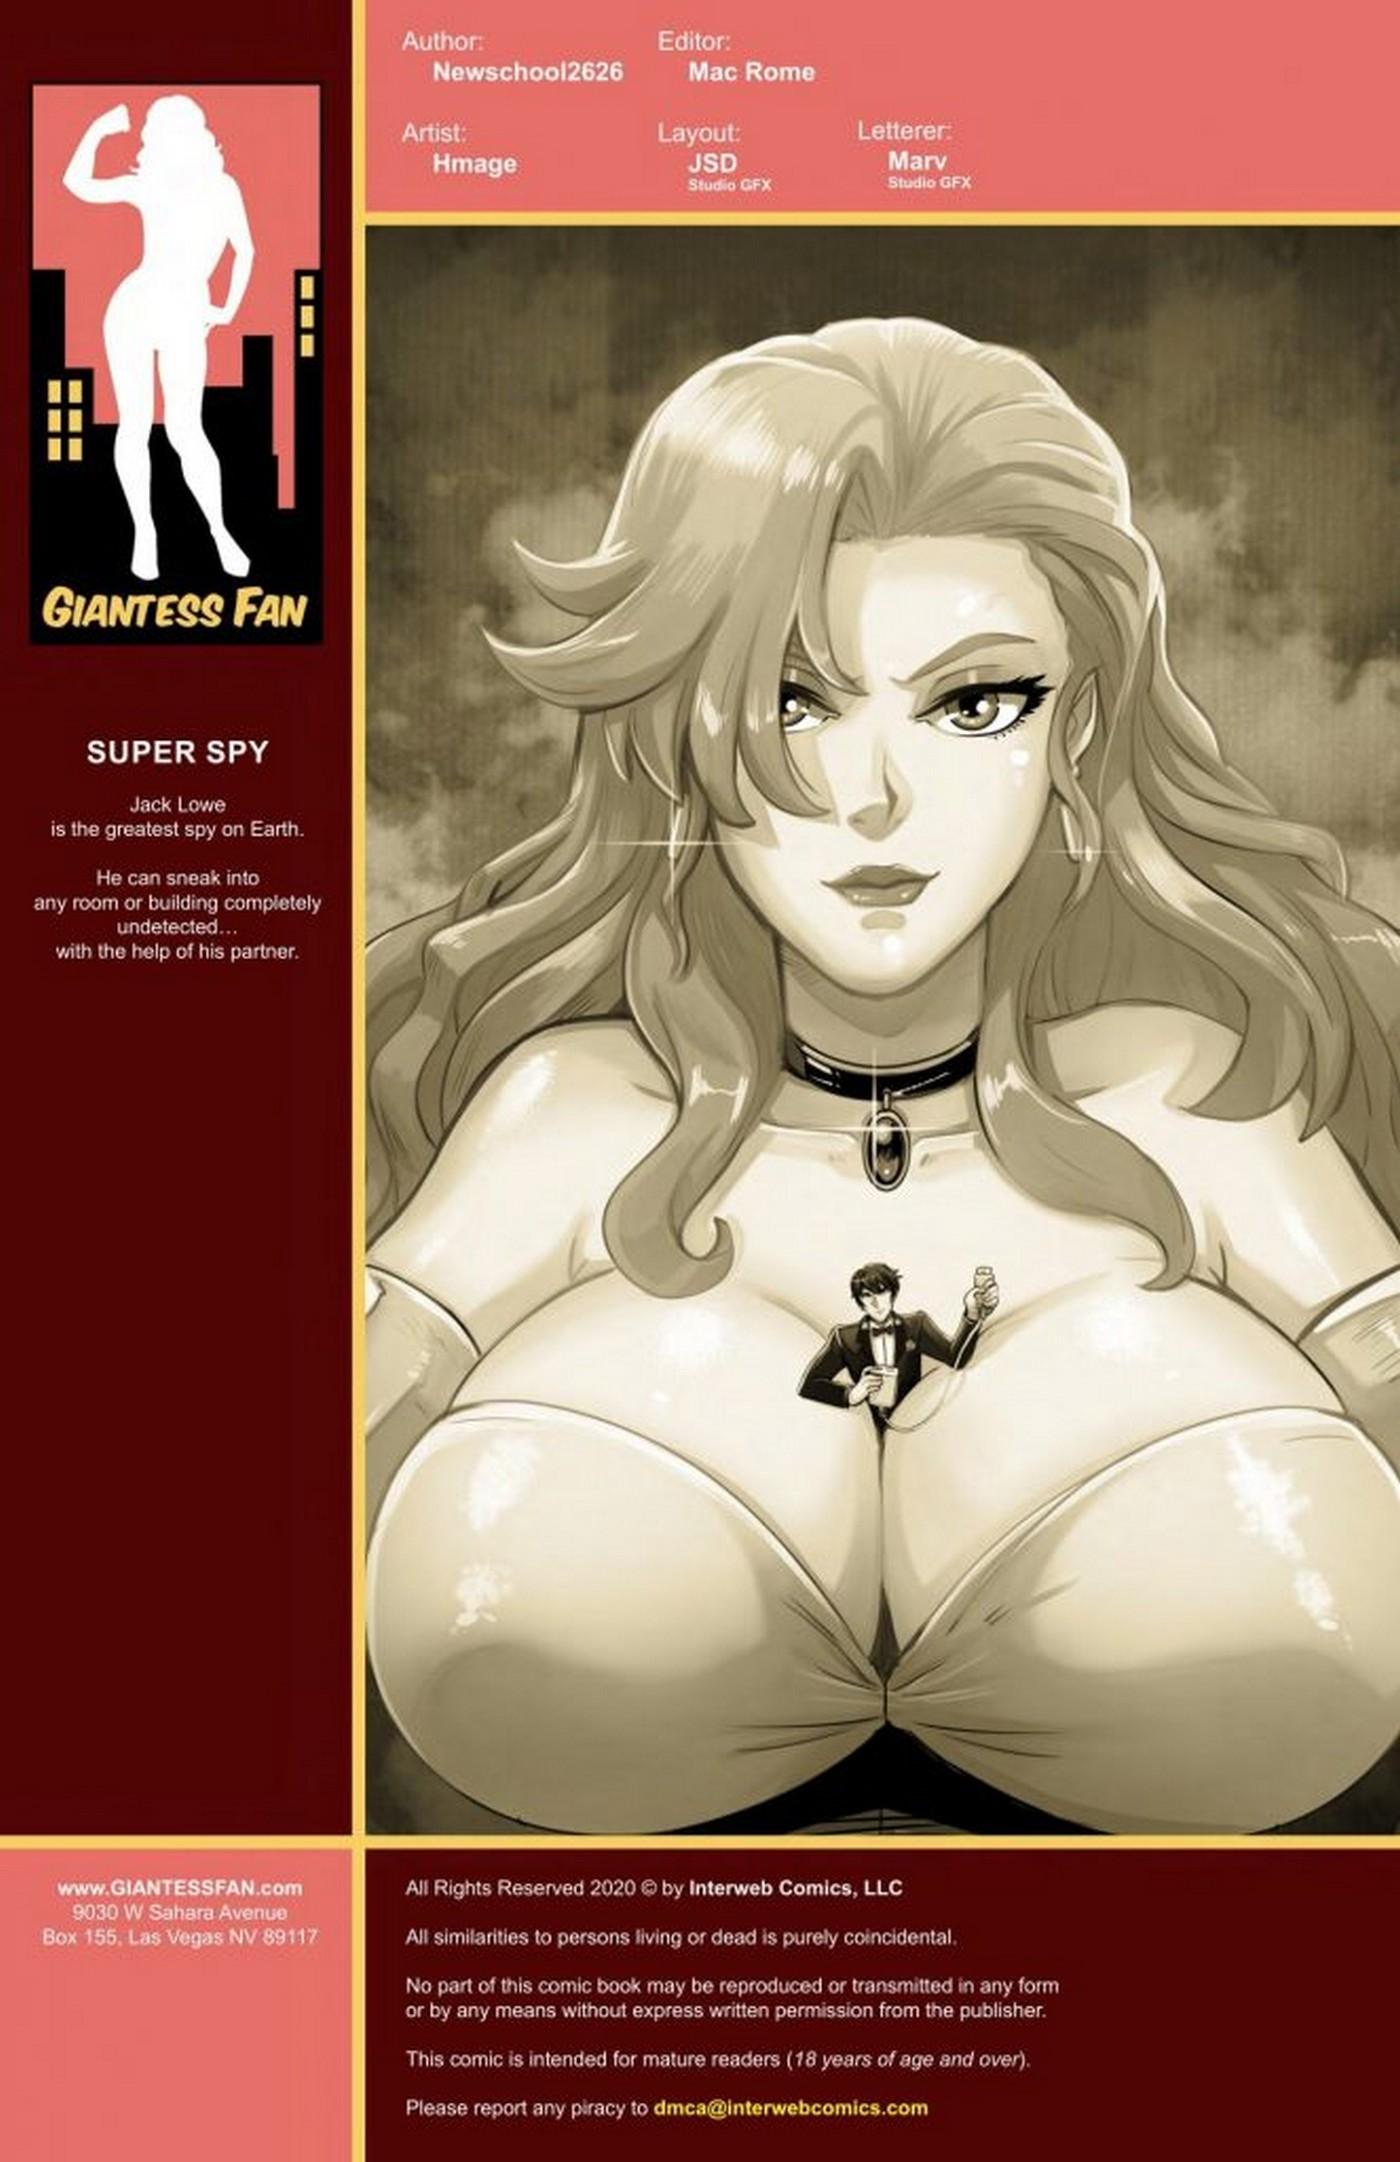 Super Spy GiantessFan 02